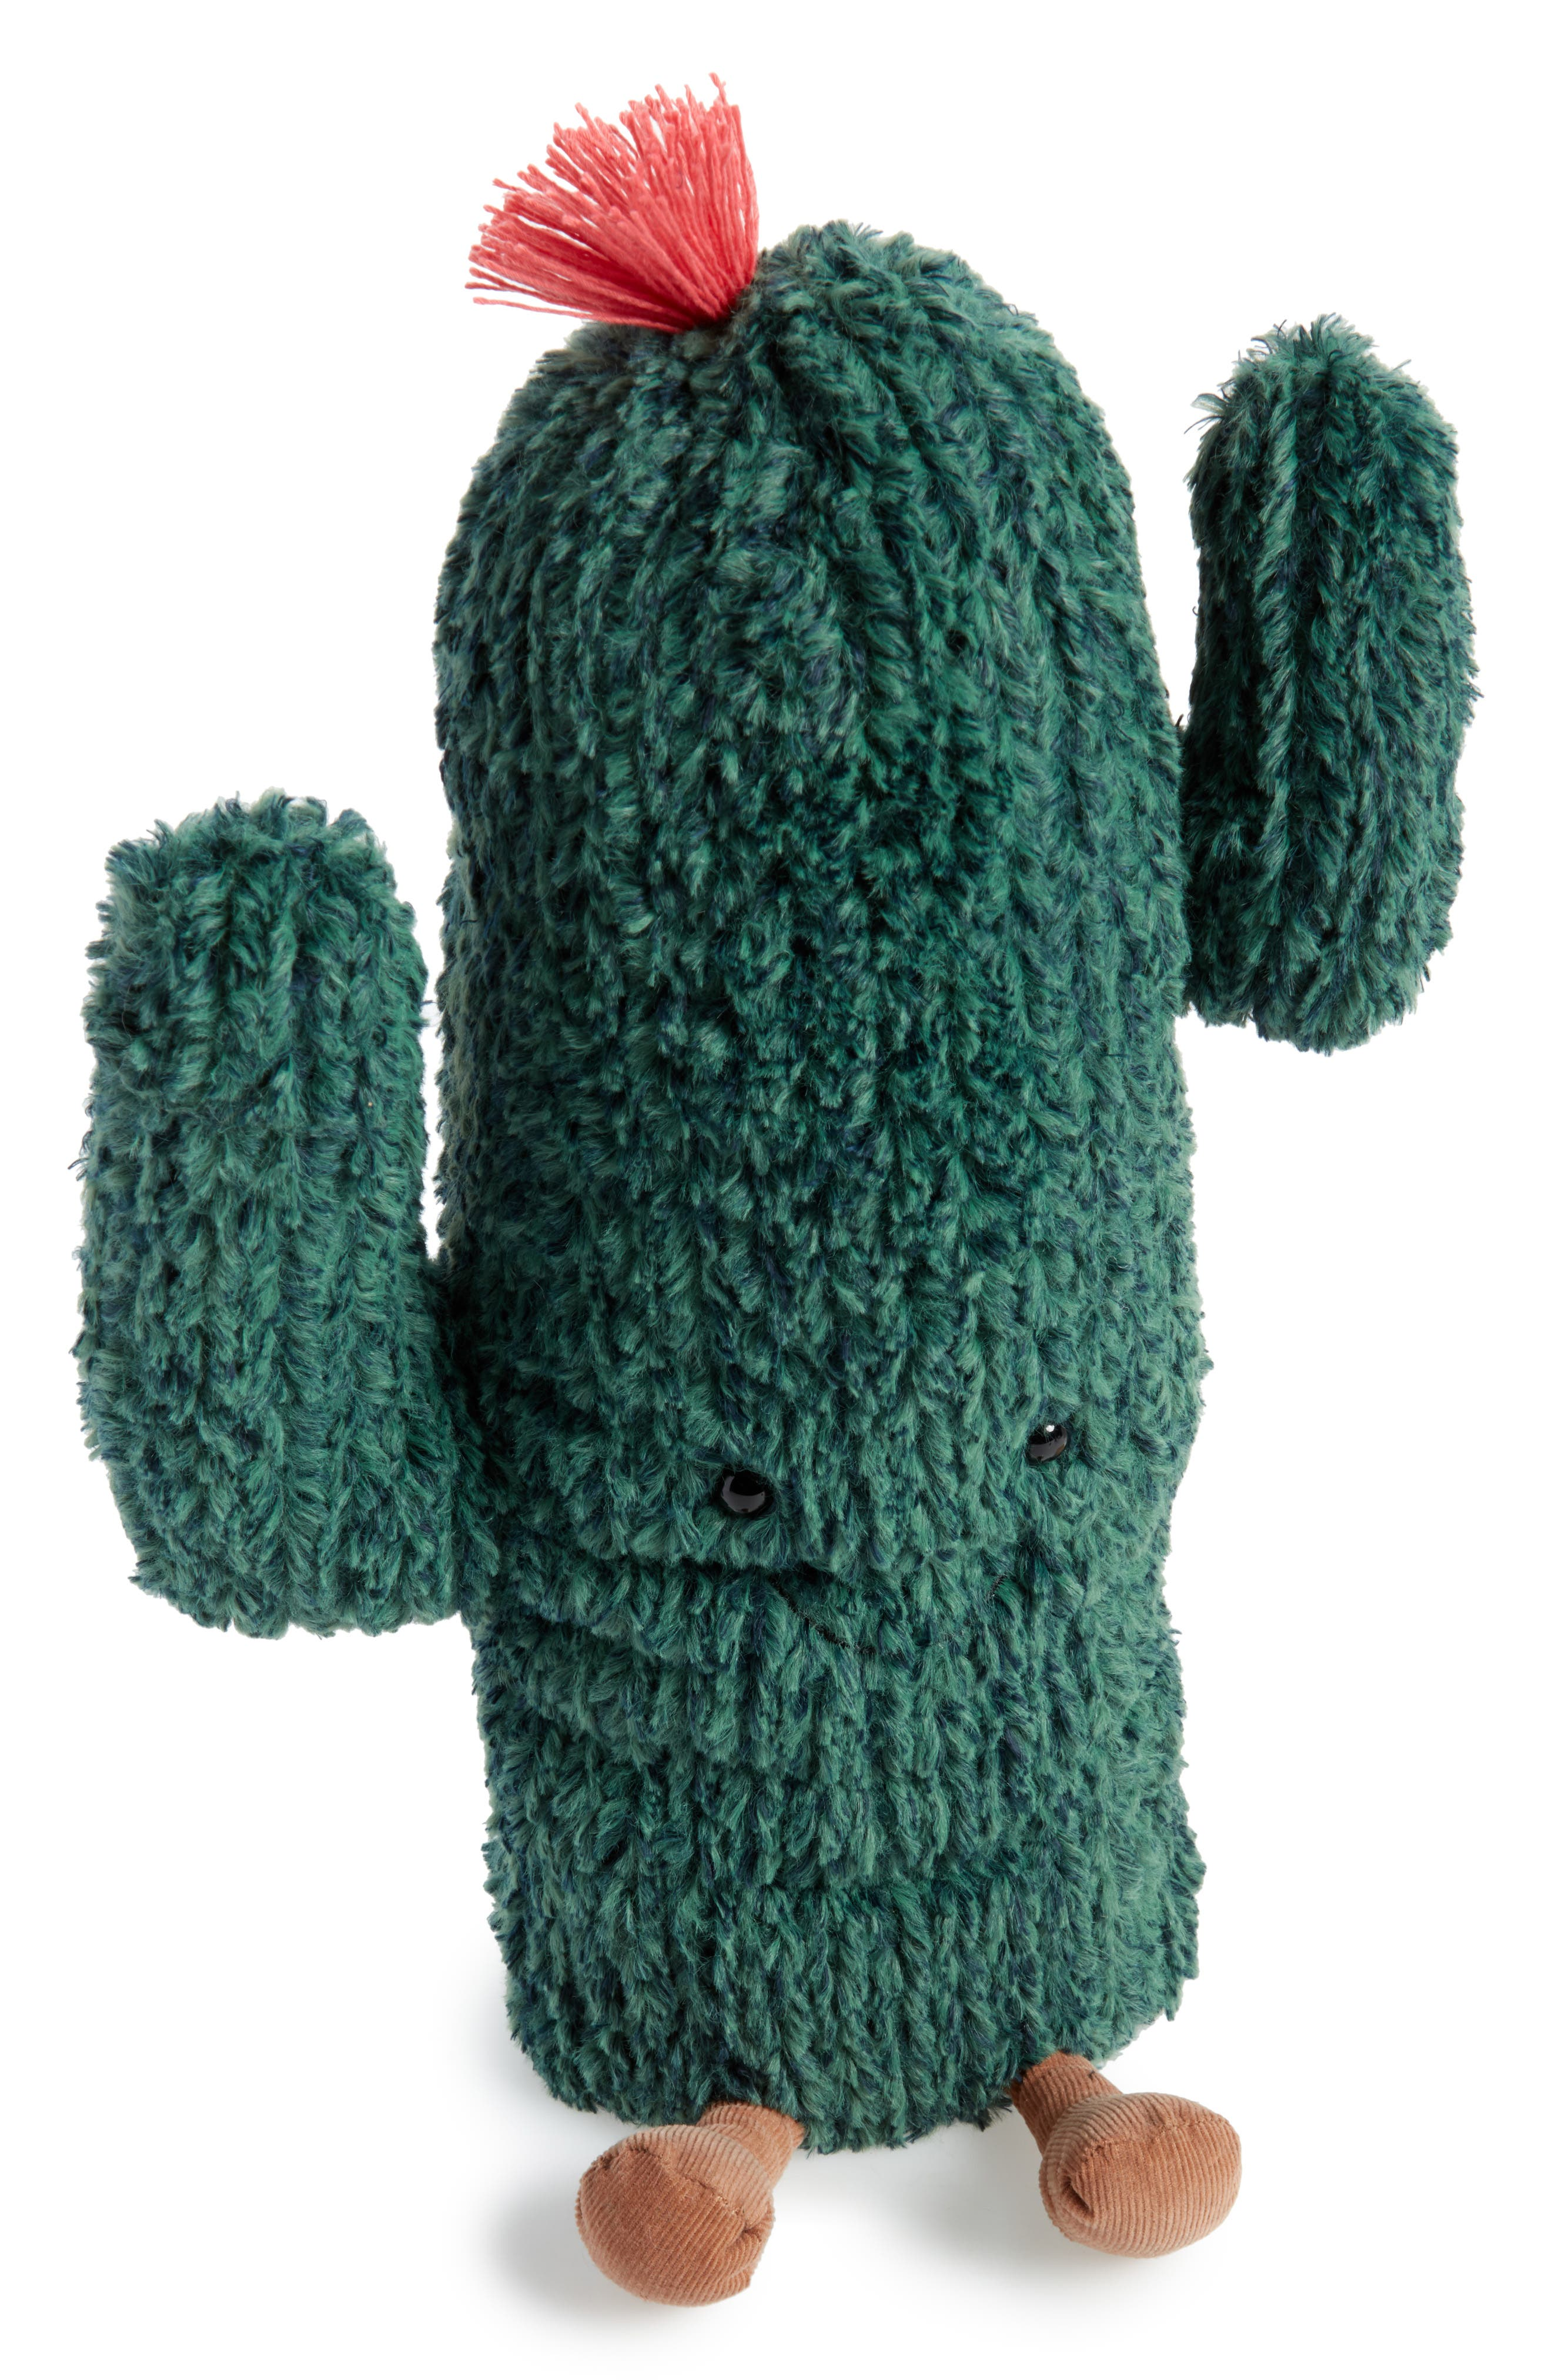 Main Image - Jellycat Amuseable Cactus Stuffed Toy